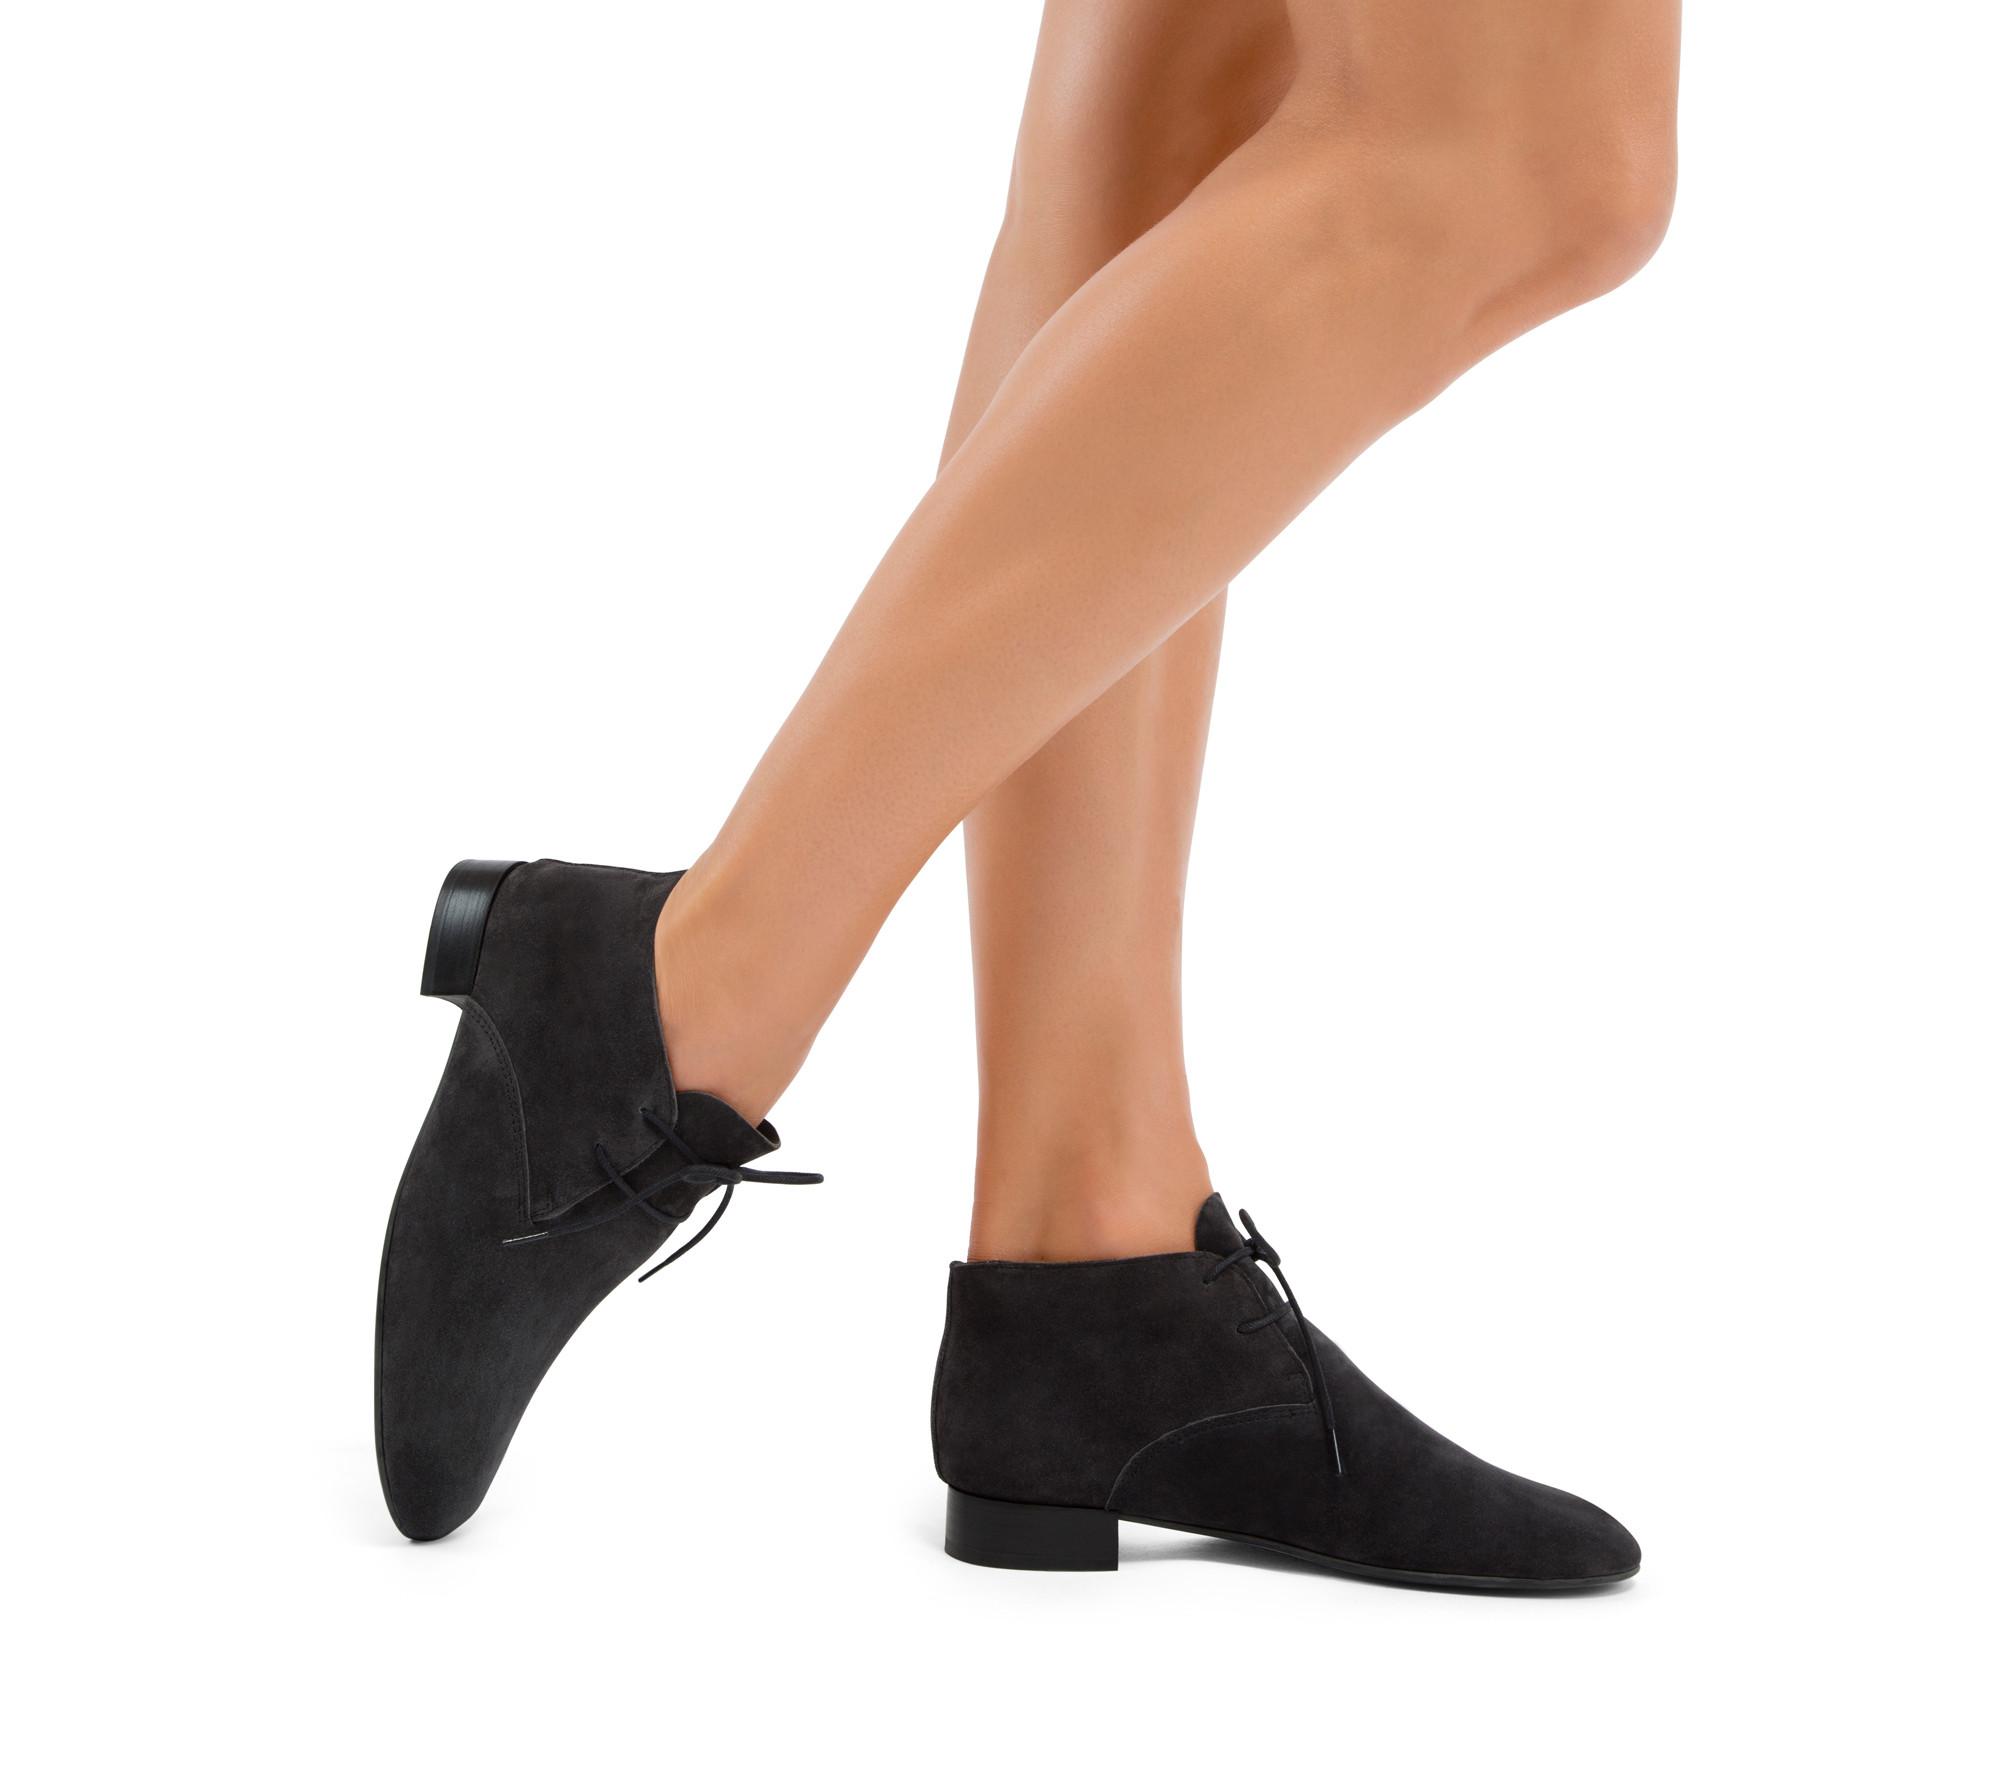 Ivanoe boots